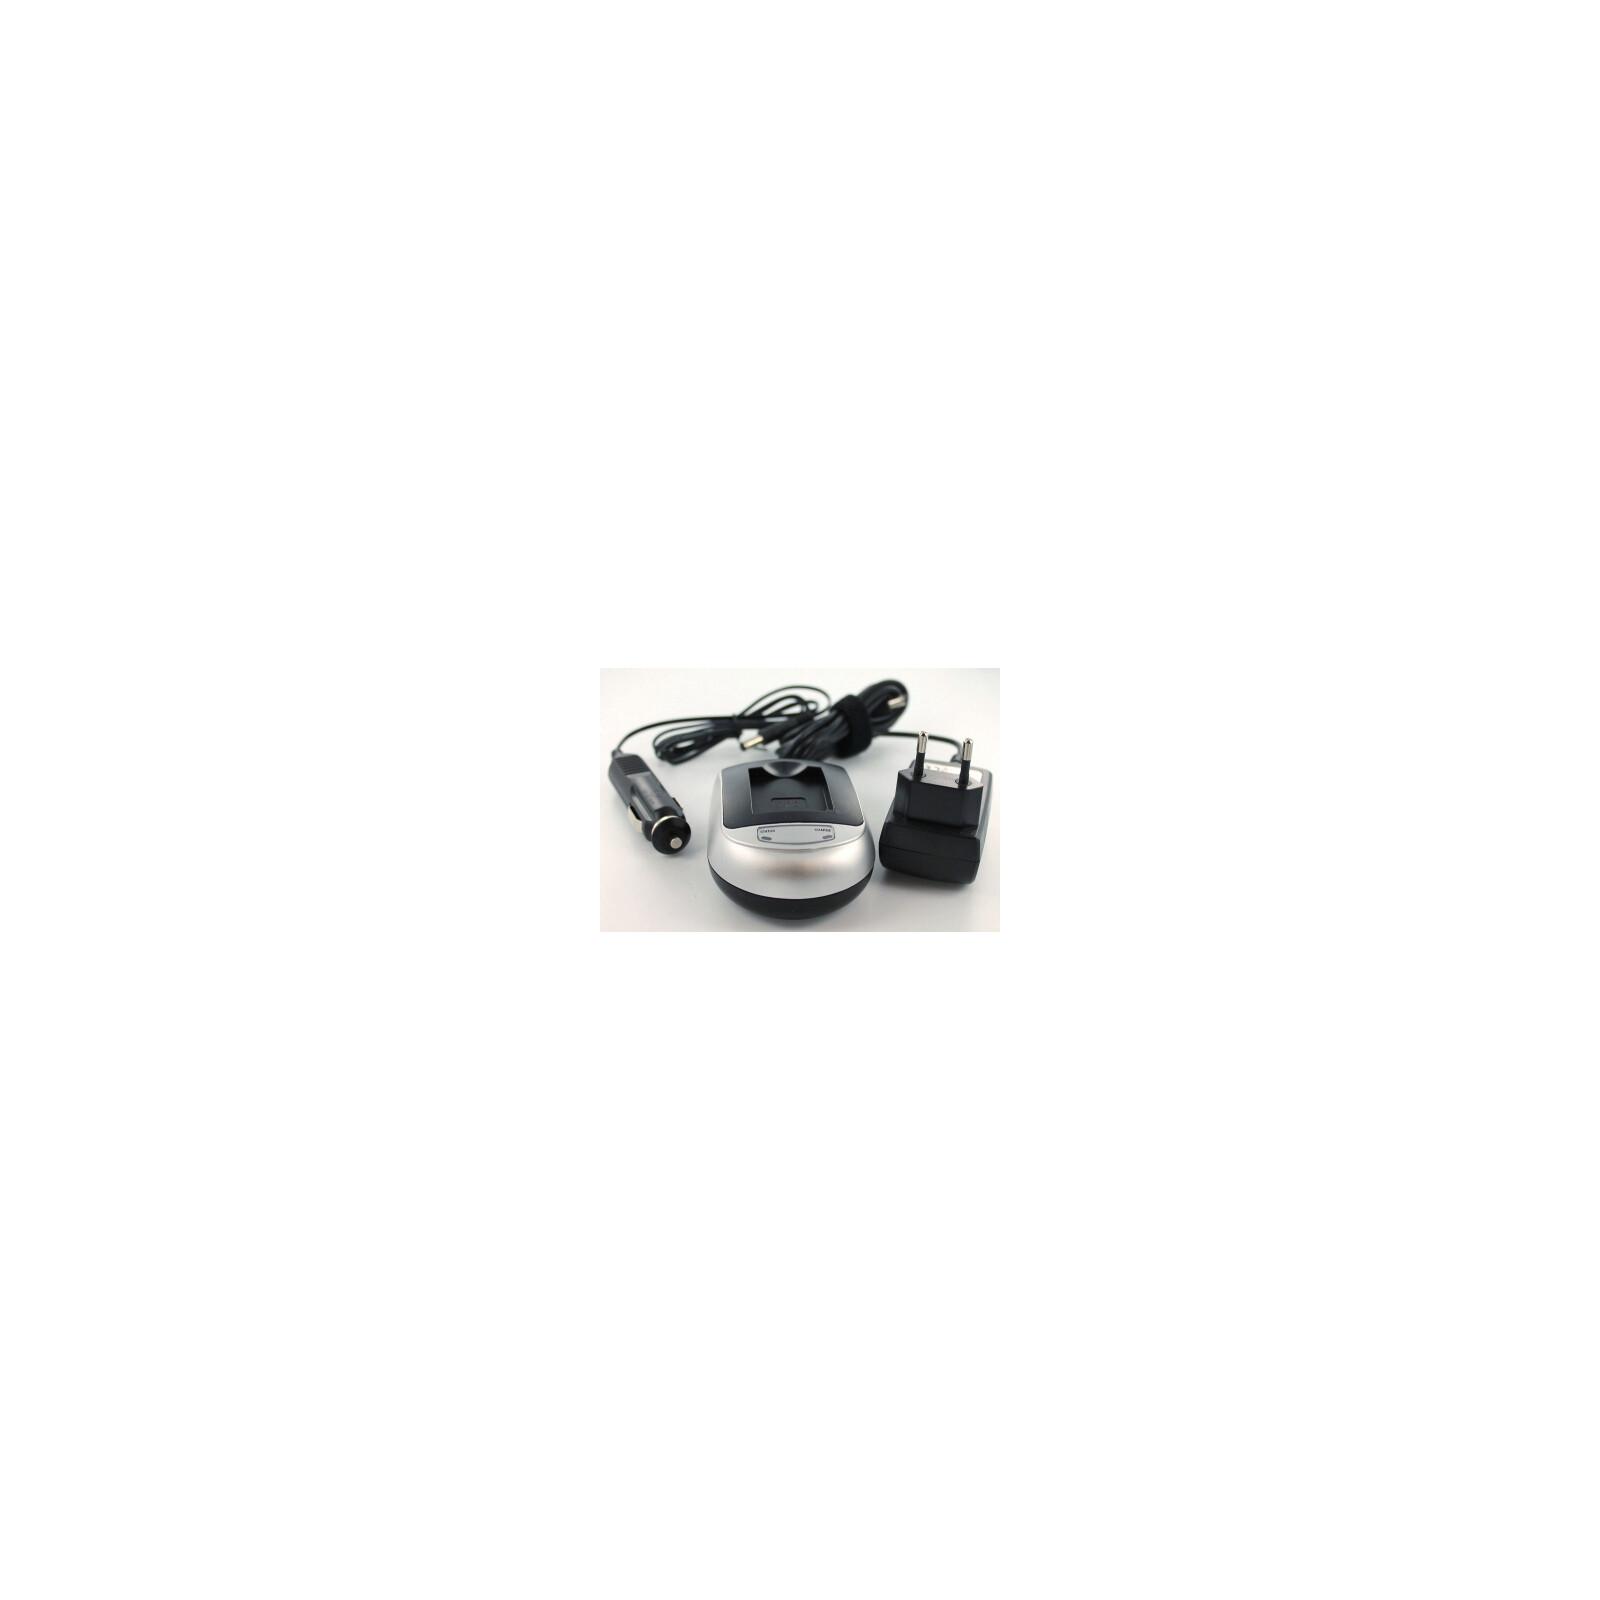 AGI 86223 Ladegerät Nikon Coolpix S6200